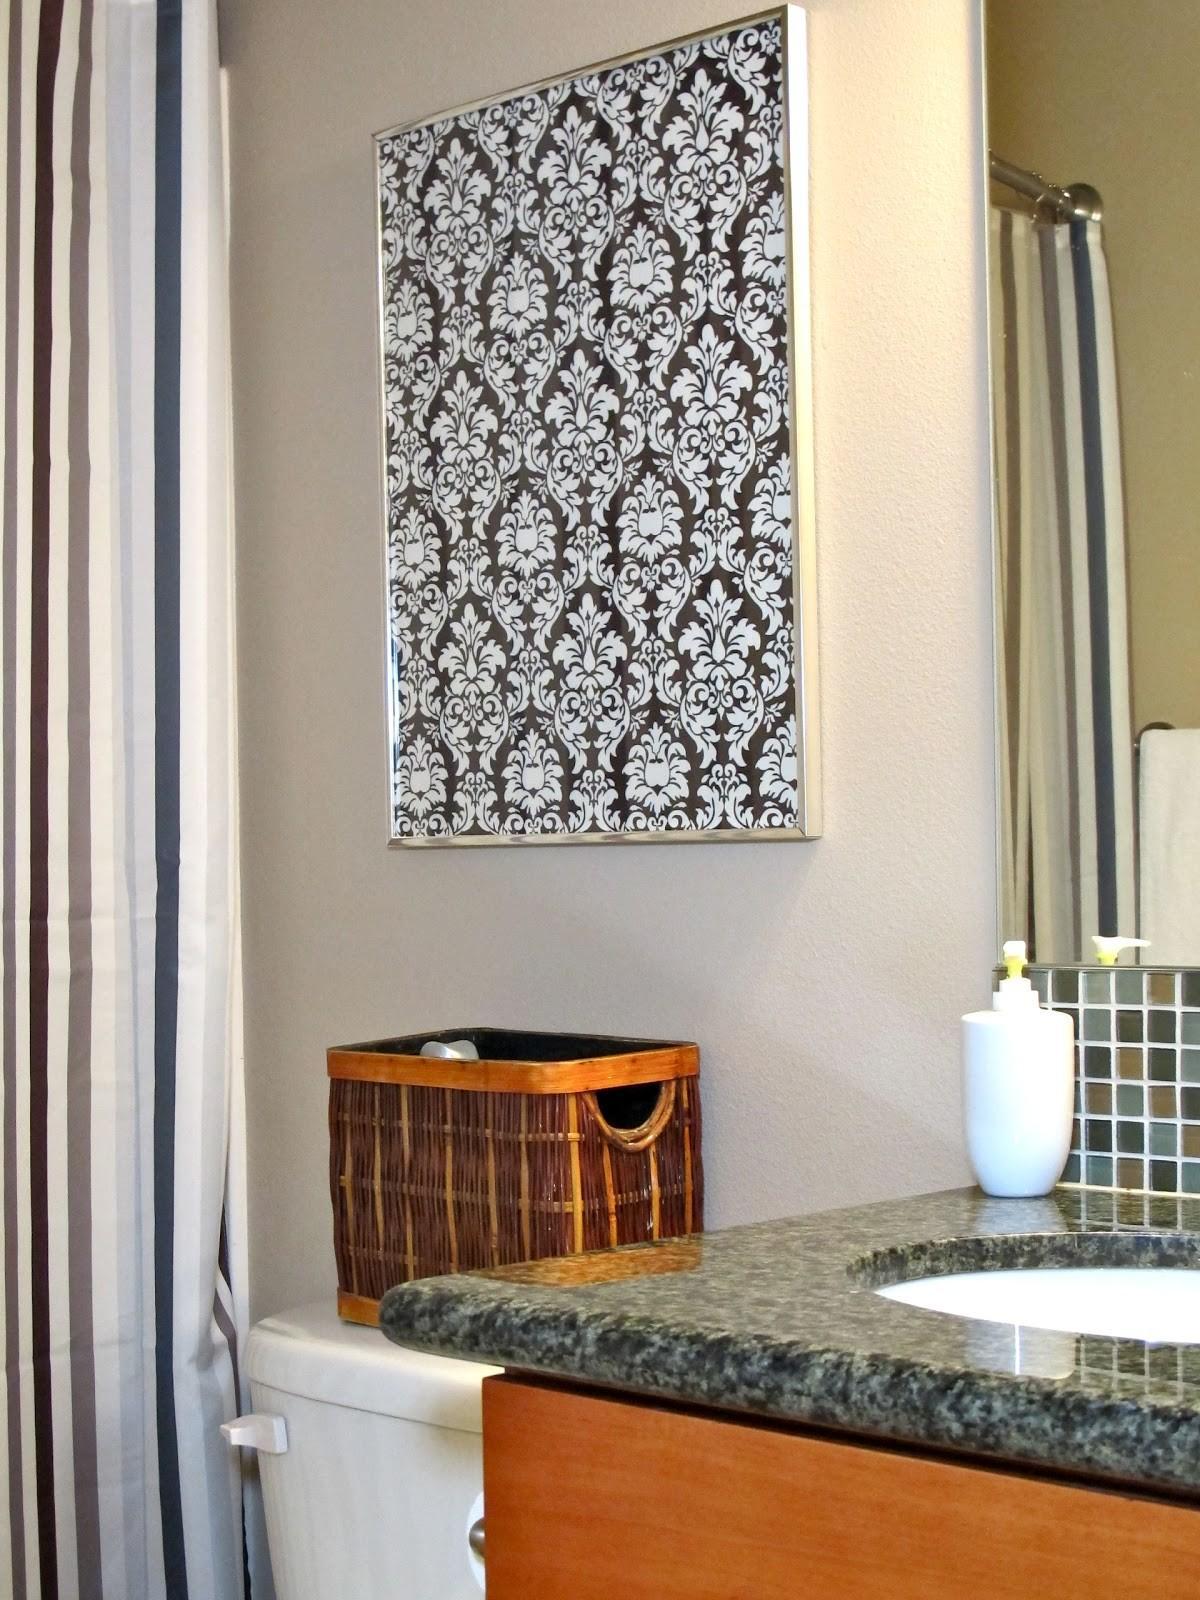 Diy Bathroom Wall Decor Fall Love Decoratorist 221155